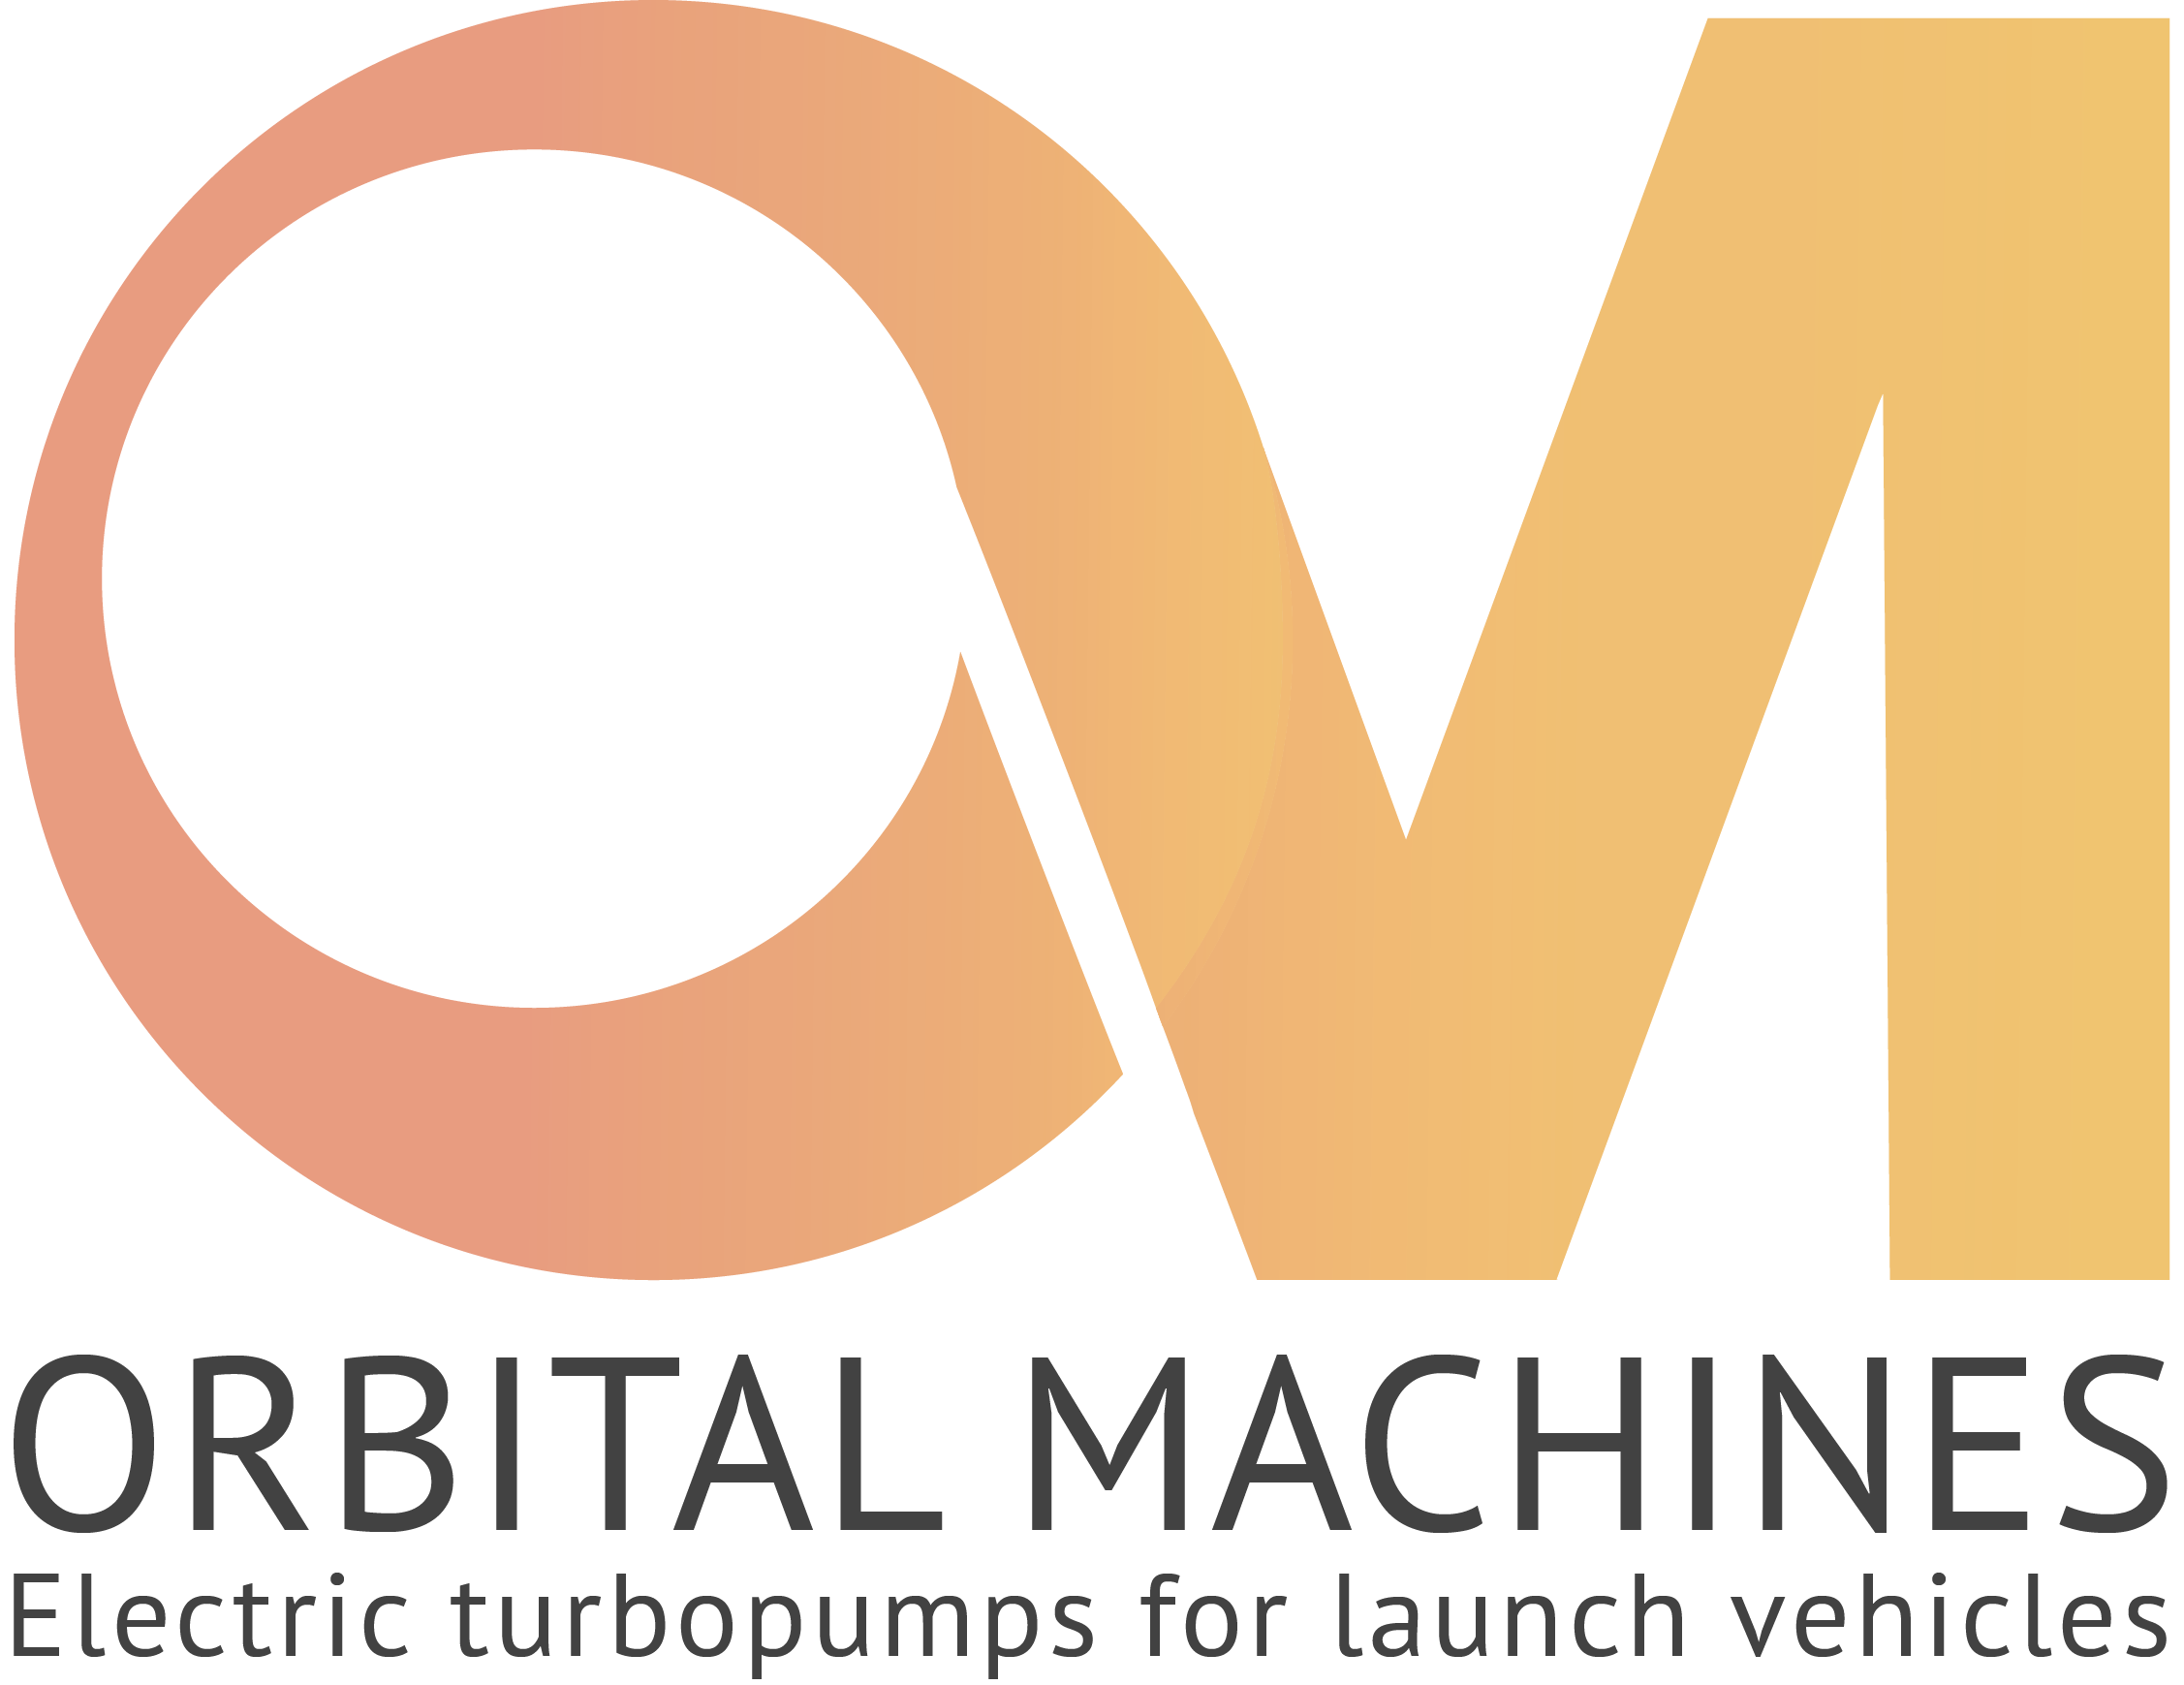 Orbital Machines